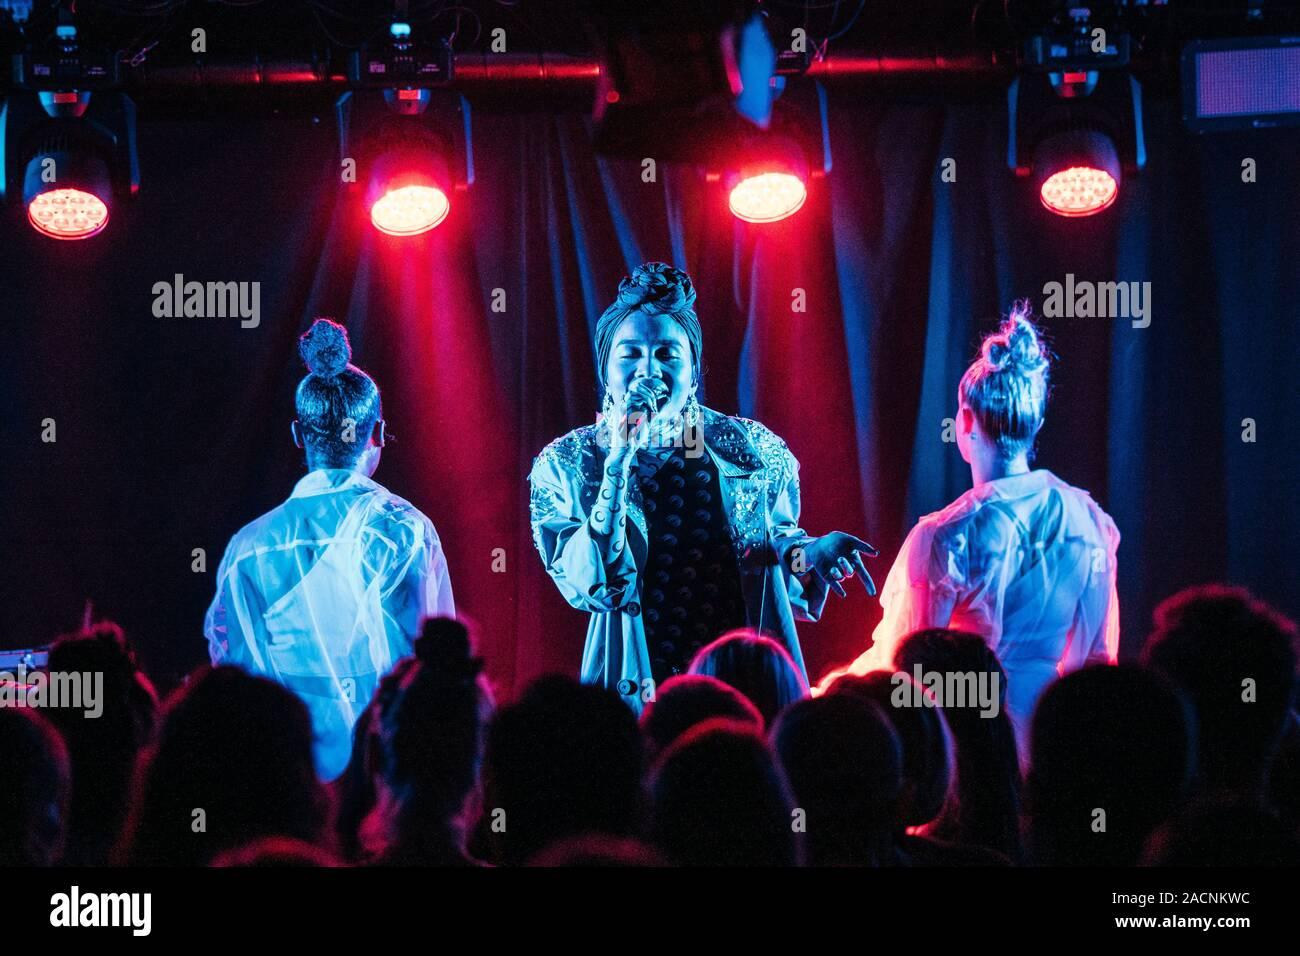 Copenhagen, Denmark. 02nd Dec, 2019. The Malaysian singer and songwriter Yuna performs a live concert at BETA in Copenhagen. (Photo Credit: Gonzales Photo/Mathias Kristensen/Alamy Live News). Stock Photo